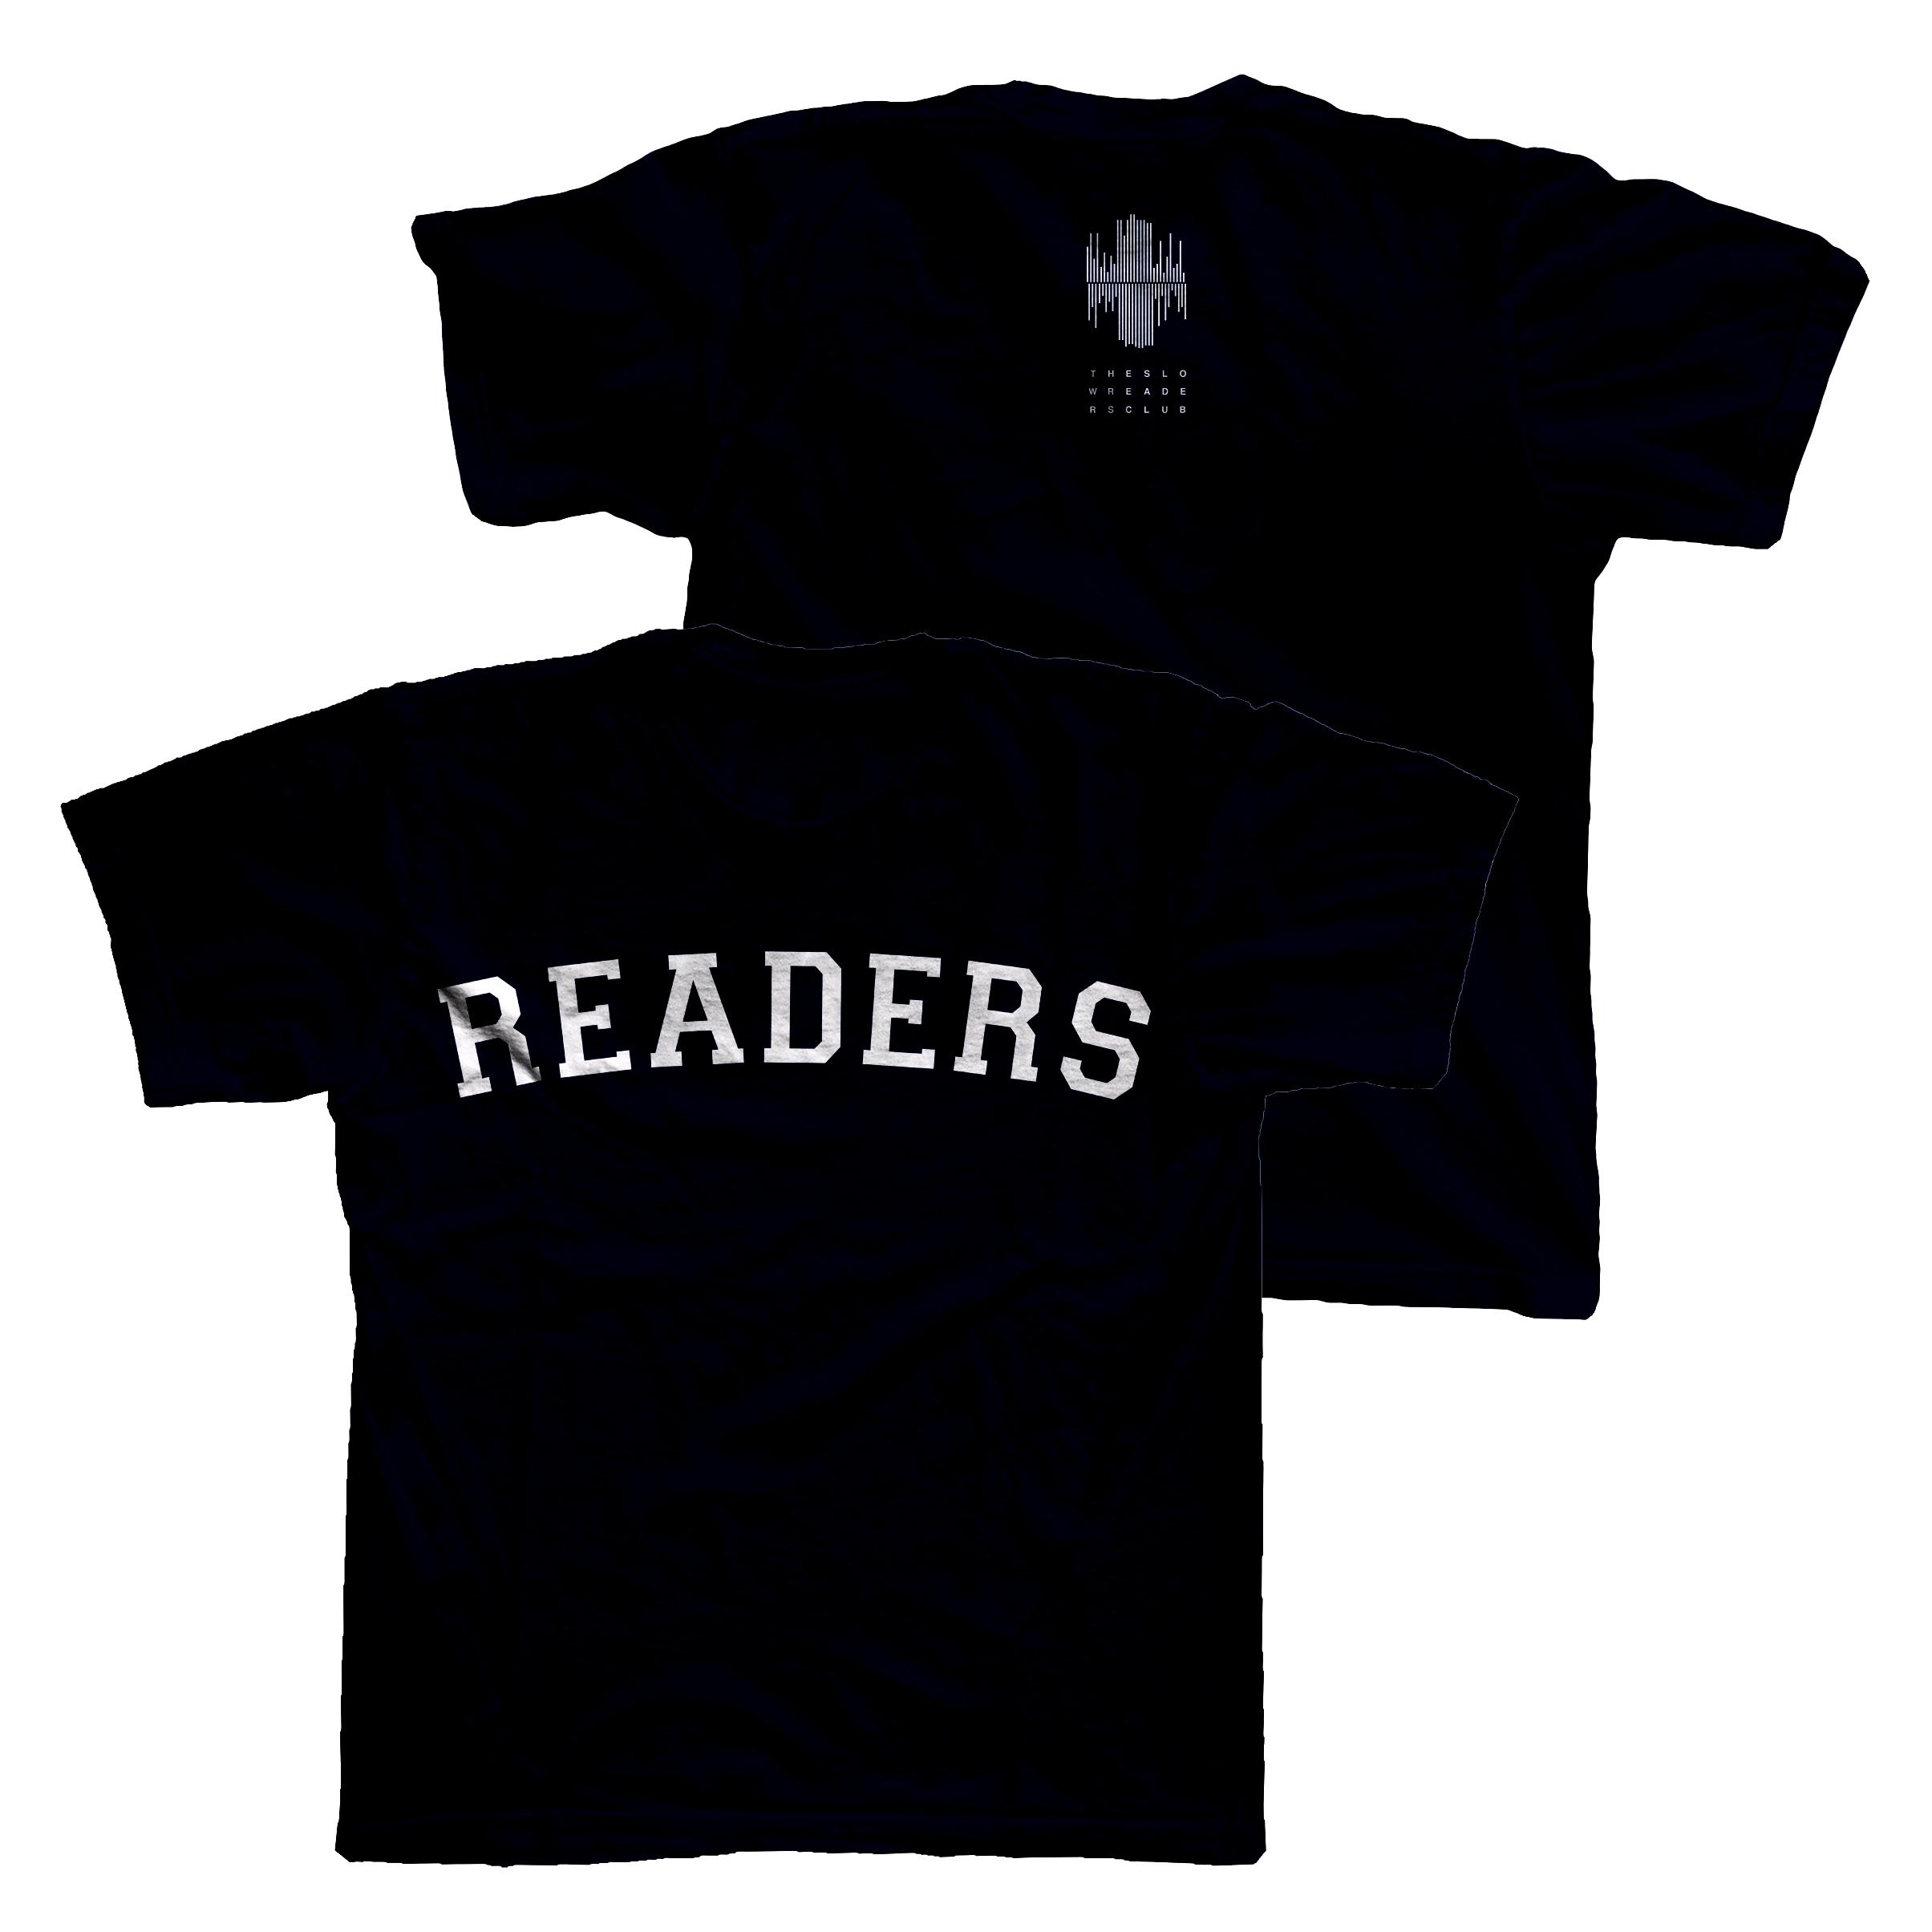 READERS T-Shirt - Black - The Slow Readers Club